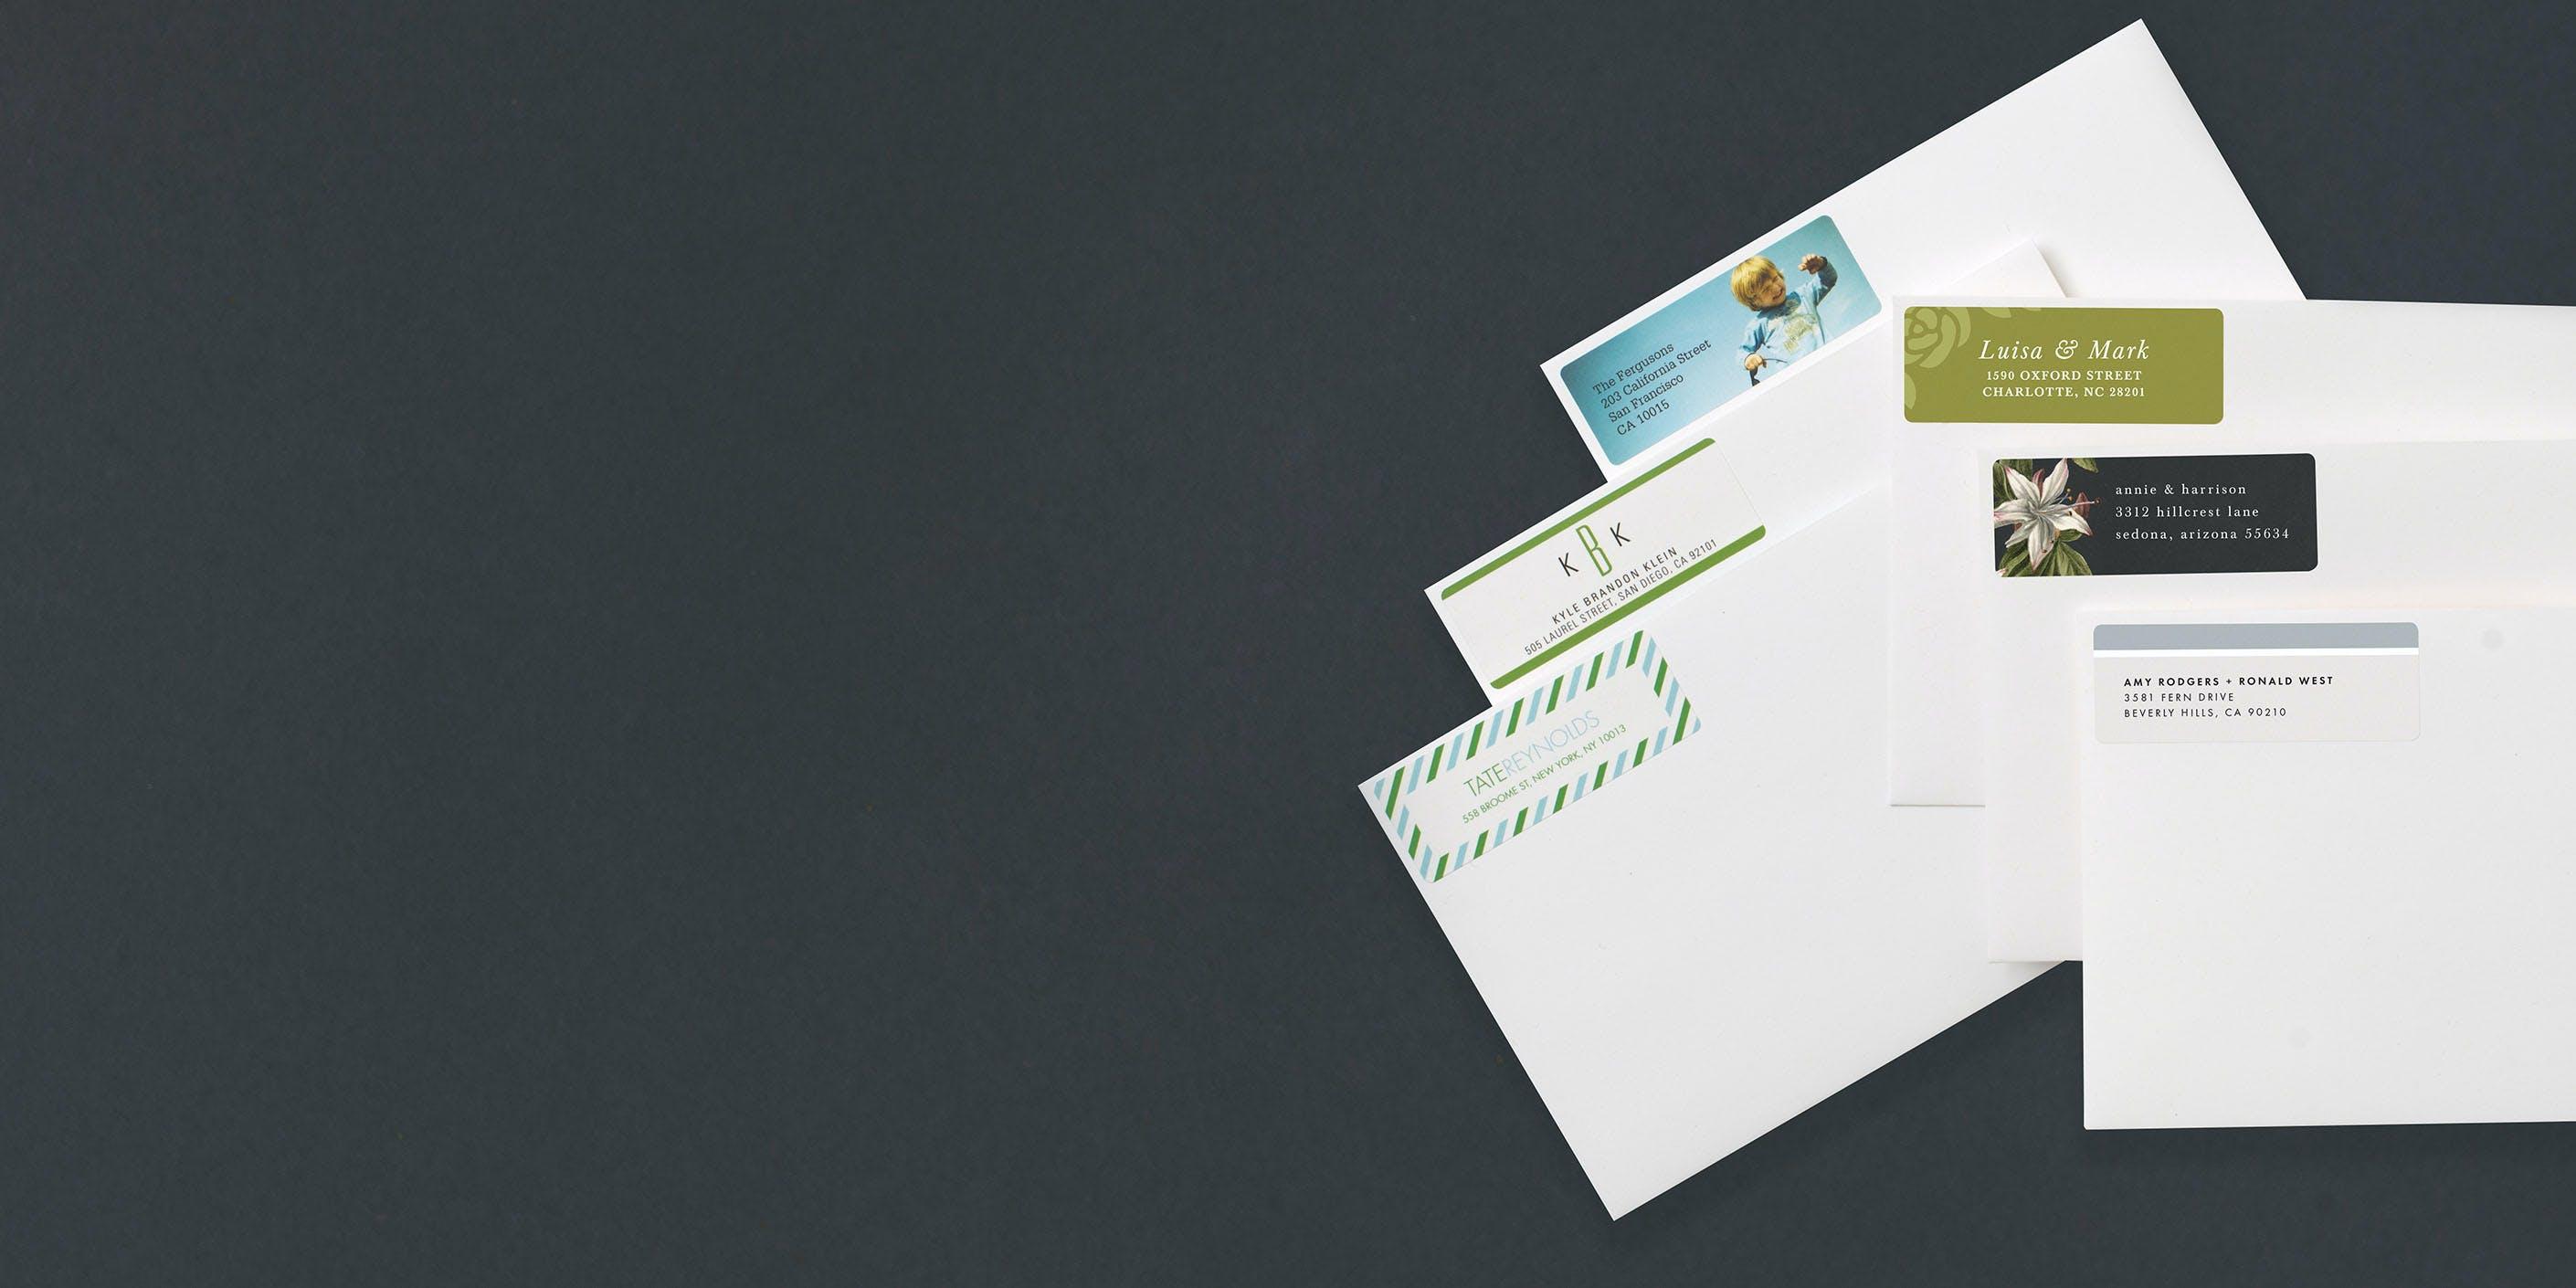 30 Custom Vintage Santa Wishes Personalized Address Labels